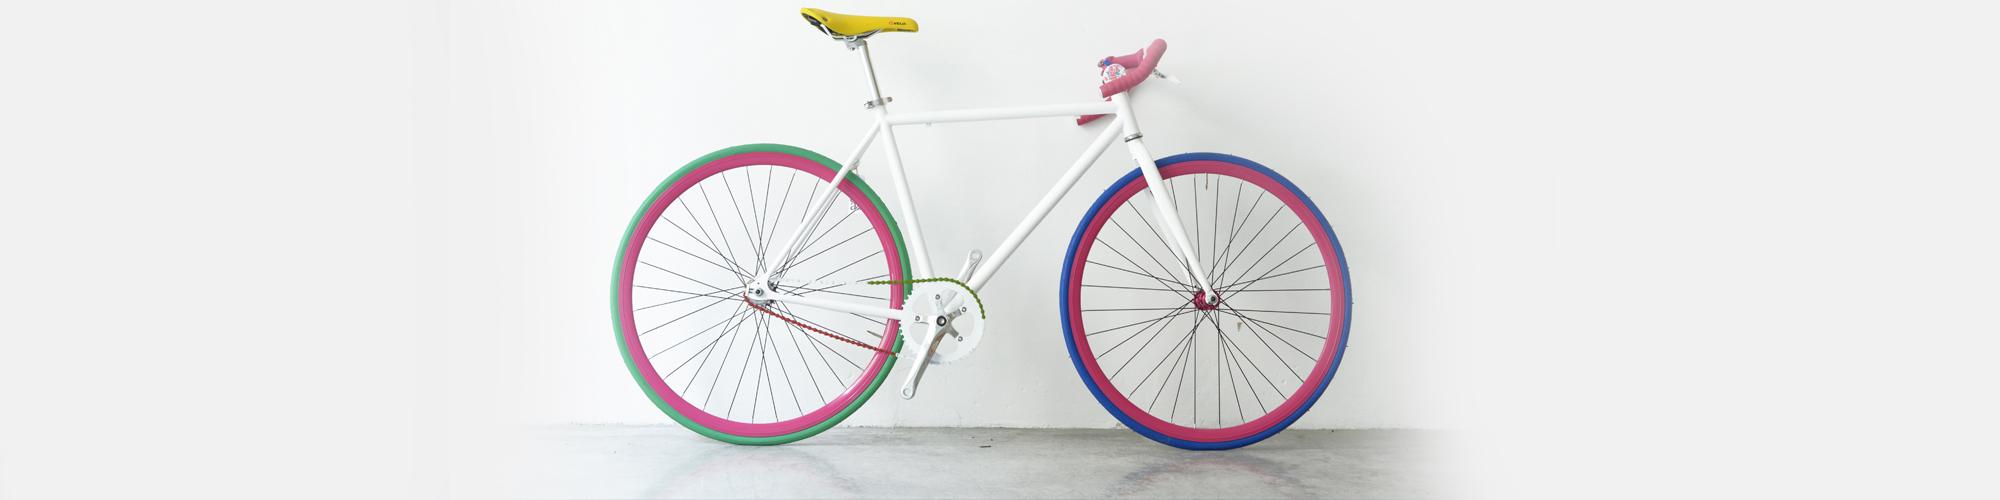 Bespoke-bike6